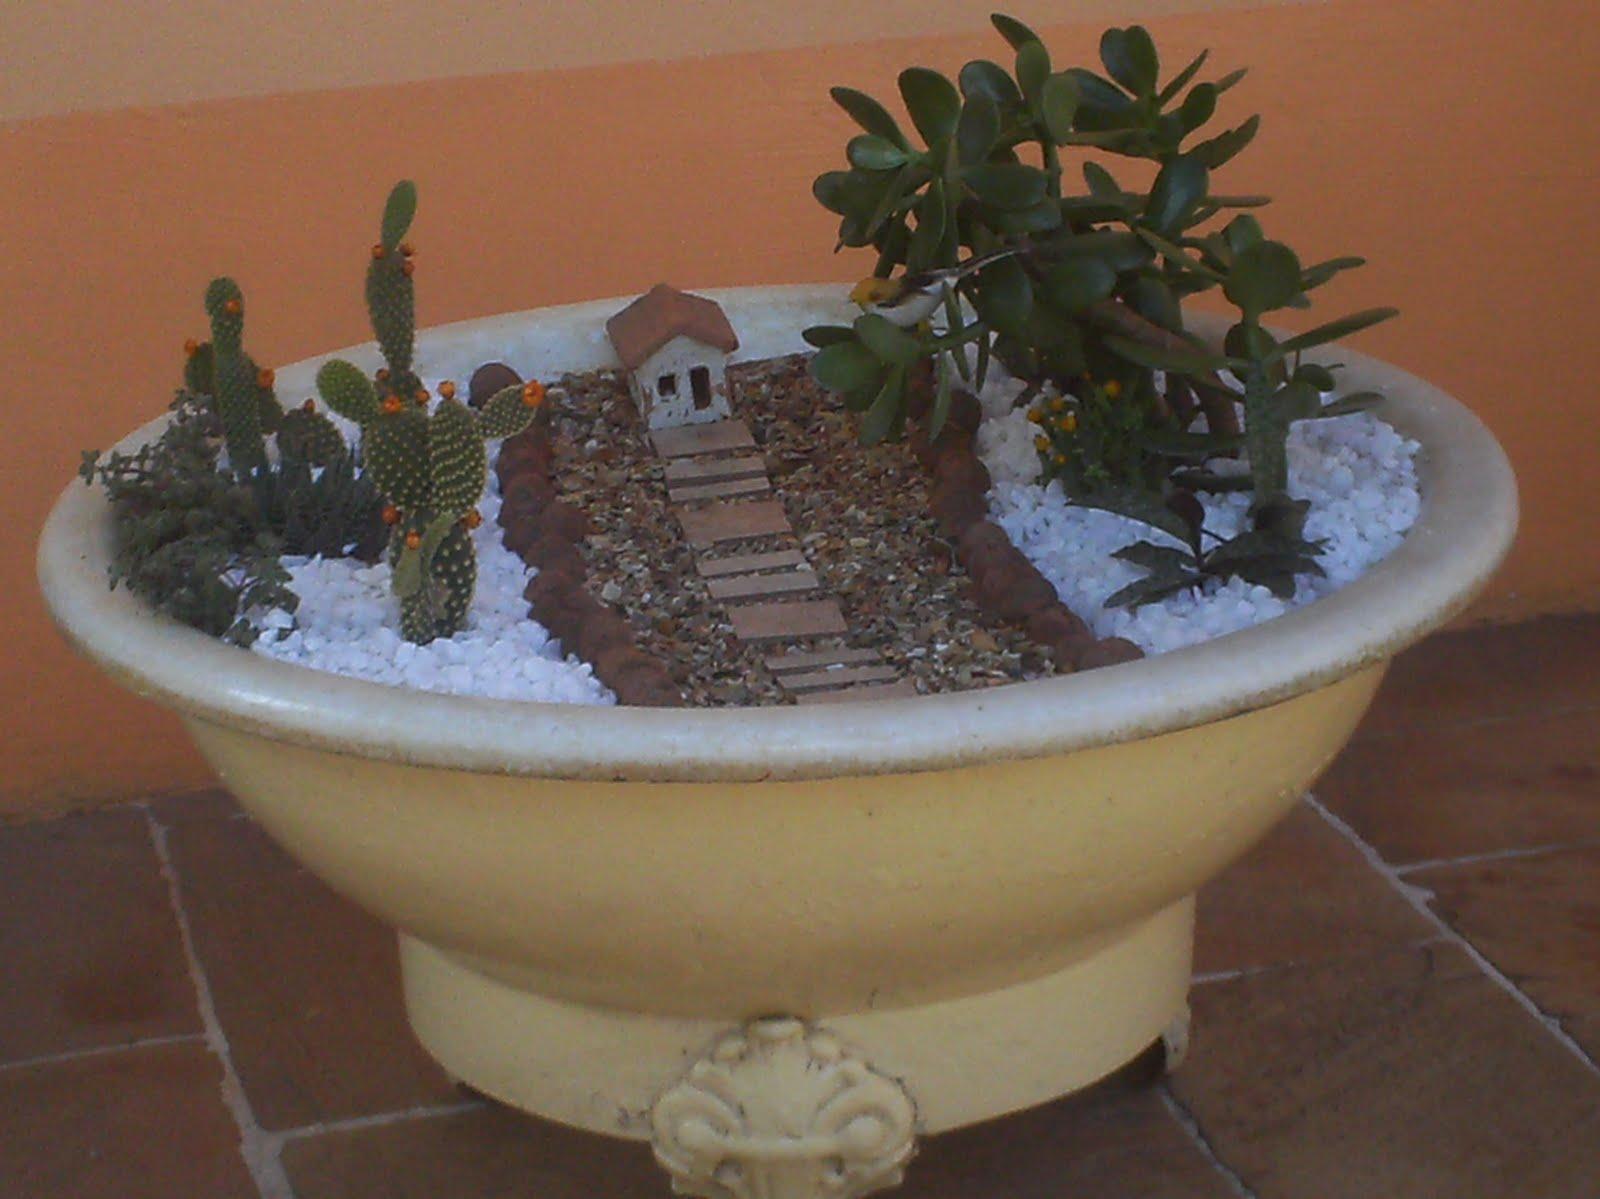 mini jardim suculentas:Plantarte Claudio: Mini Jardim com Suculentas em Bidê de Ferro